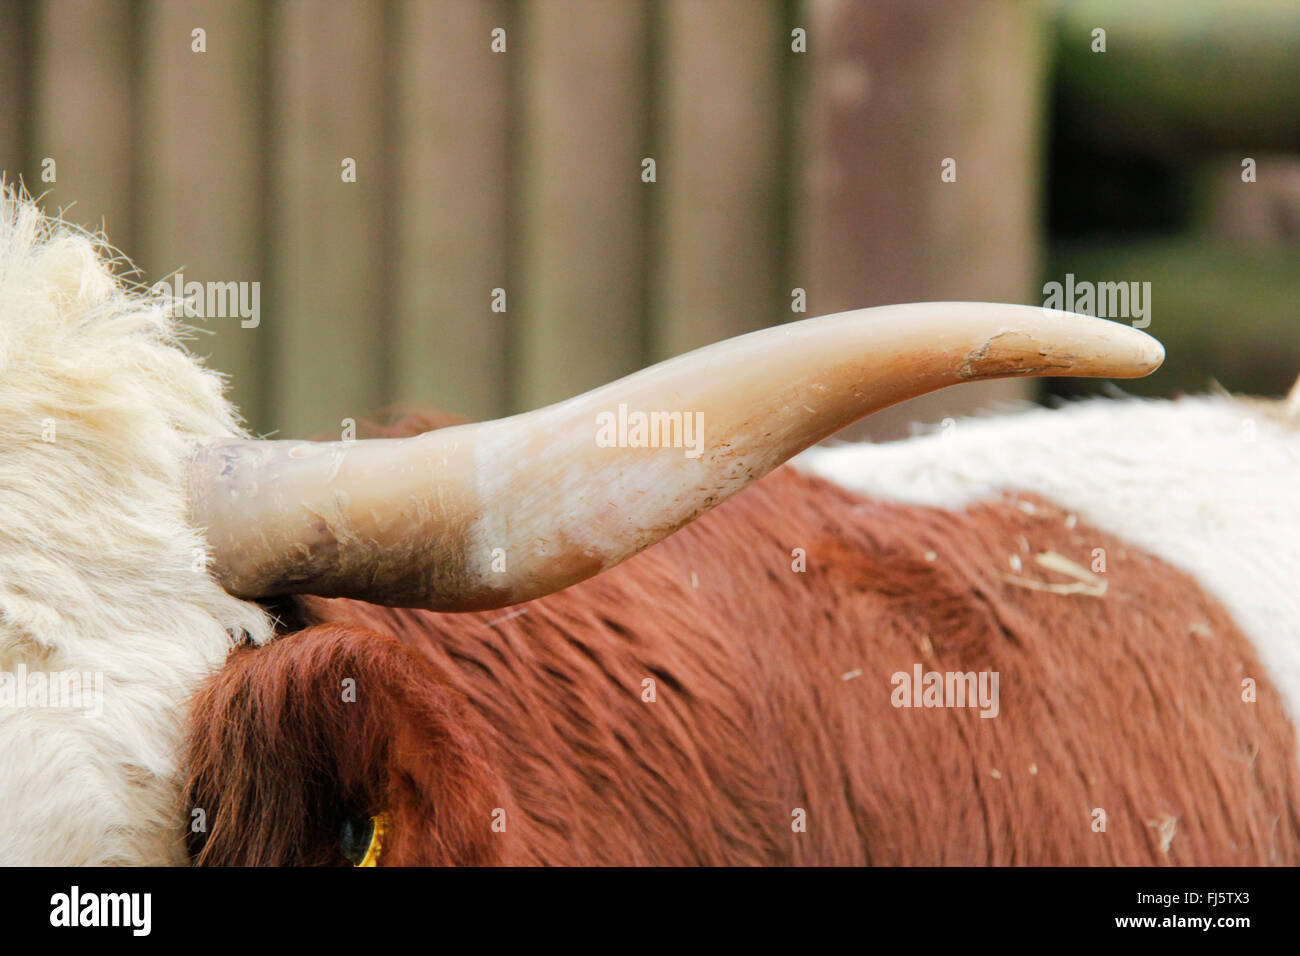 Hinterwald, Hinterwaelder-Rind, Hinterwaelder cattle (Bos primigenius f. taurus), horn, Germany - Stock Image